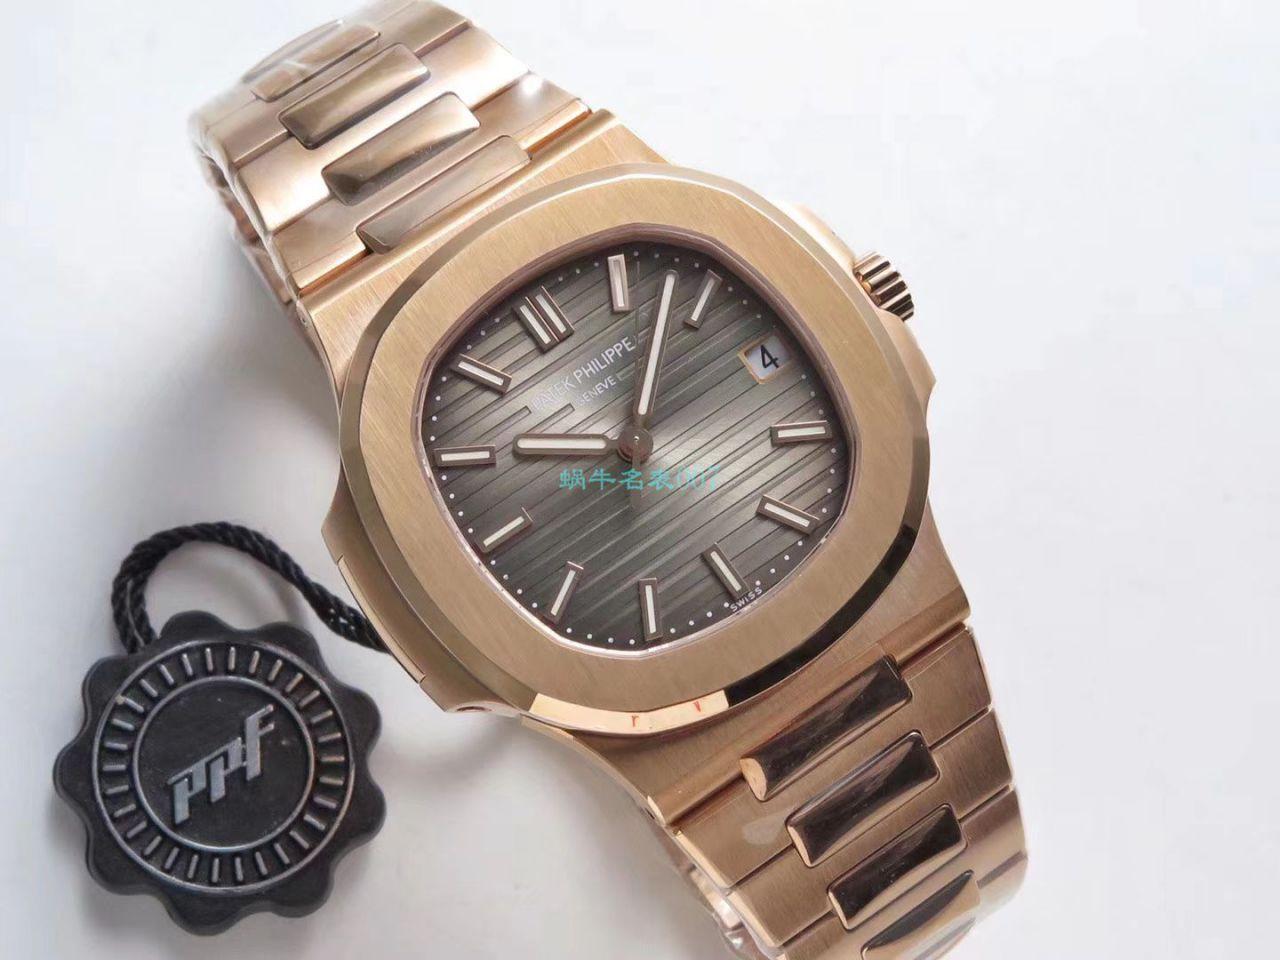 【PPF厂鹦鹉螺复刻最好版本手表V2价格】百达翡丽运动系列5711/1R-001腕表 / BD253